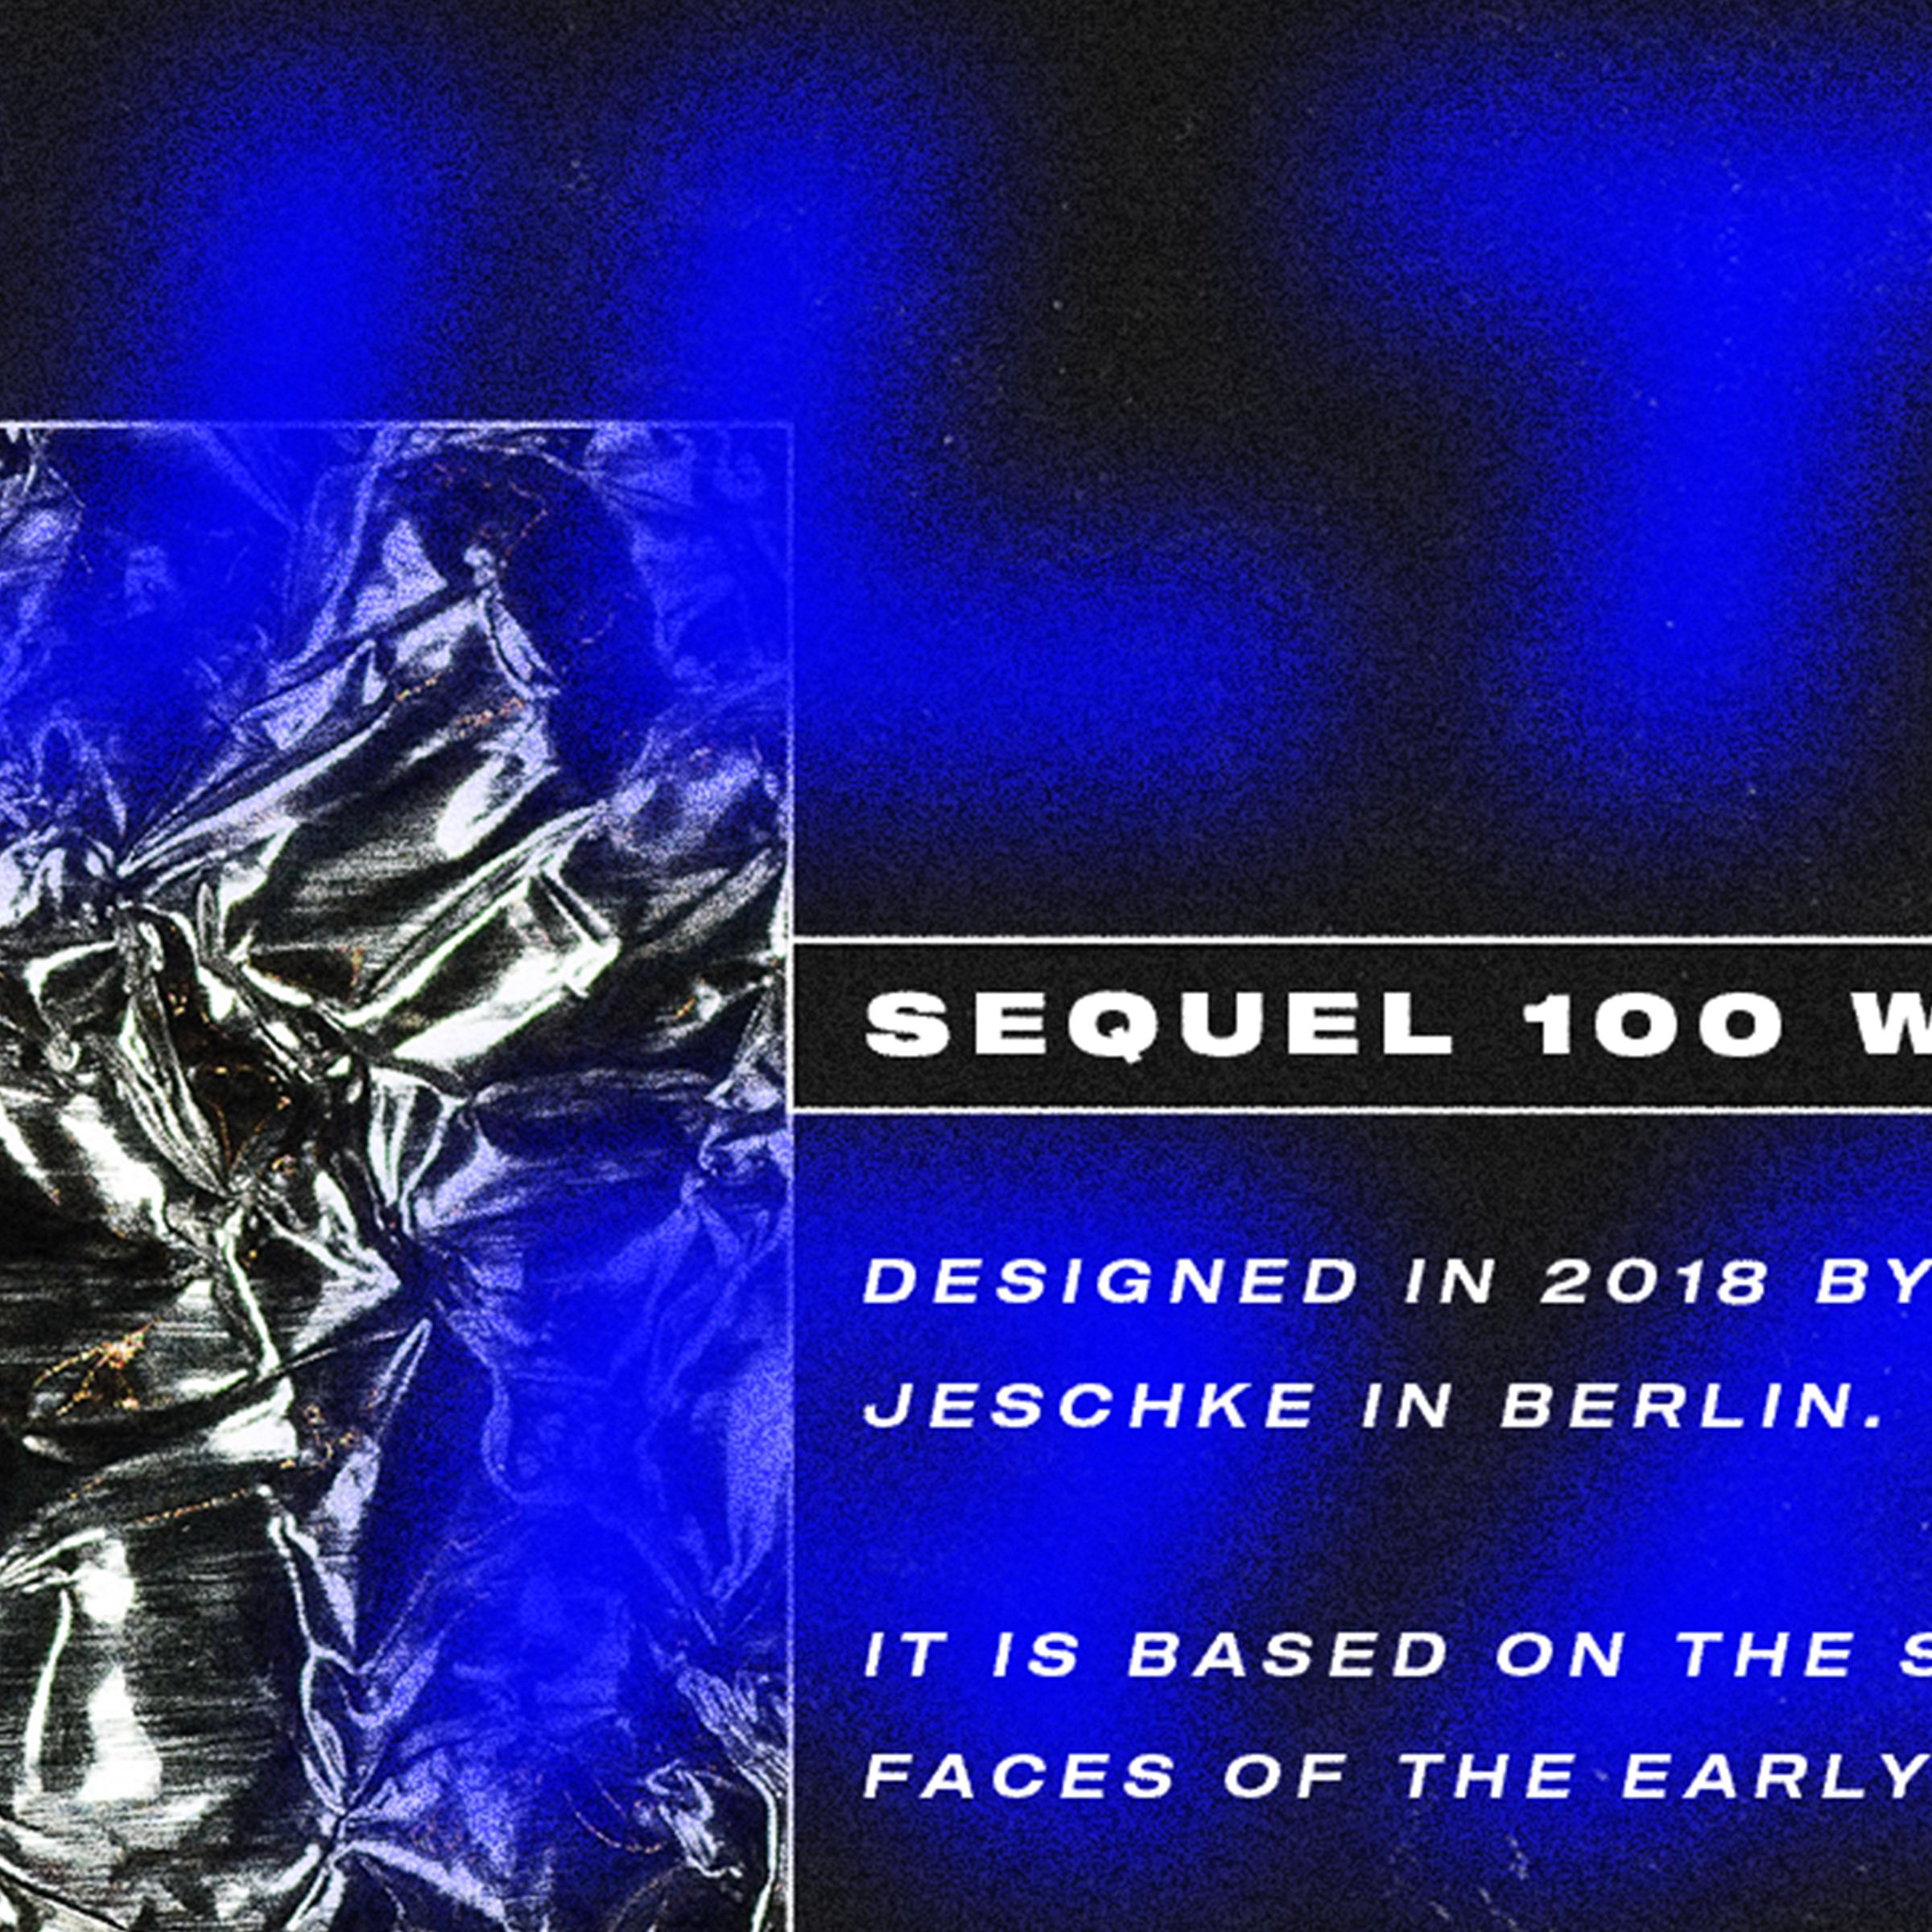 sequel1003.png